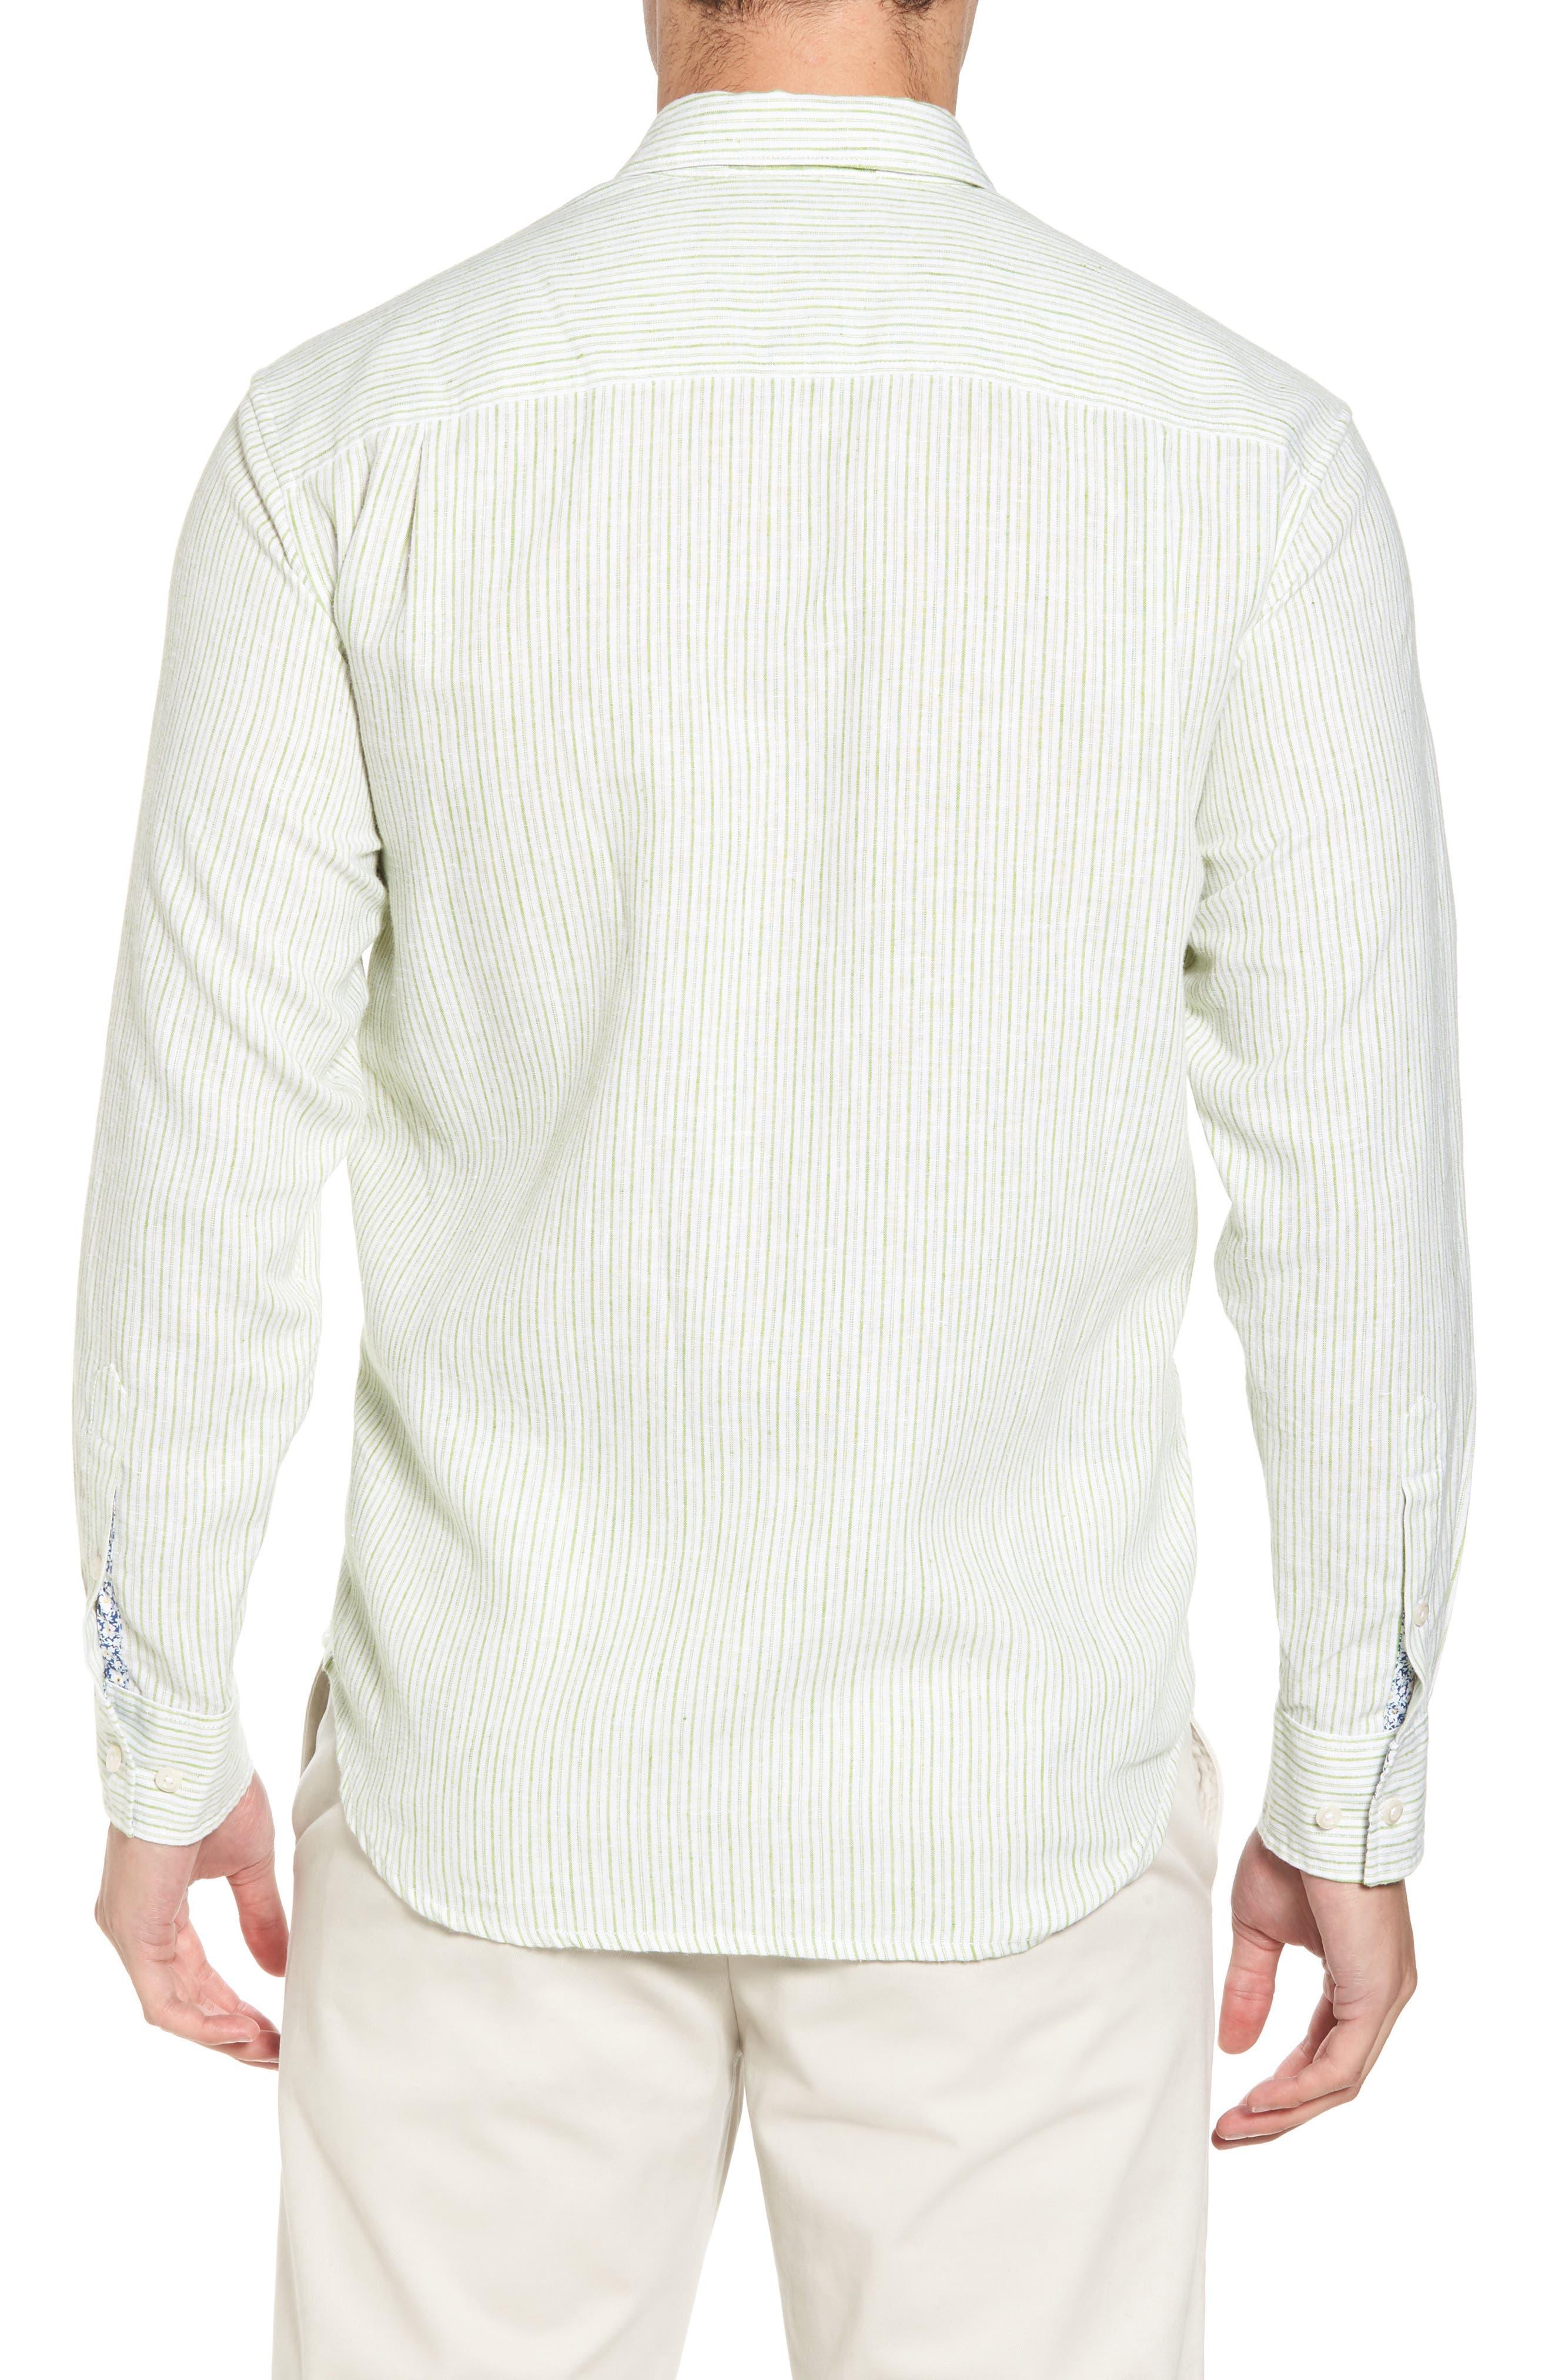 Alternate Image 2  - Tommy Bahama Bungalow Stripe Regular Fit Linen Blend Sport Shirt